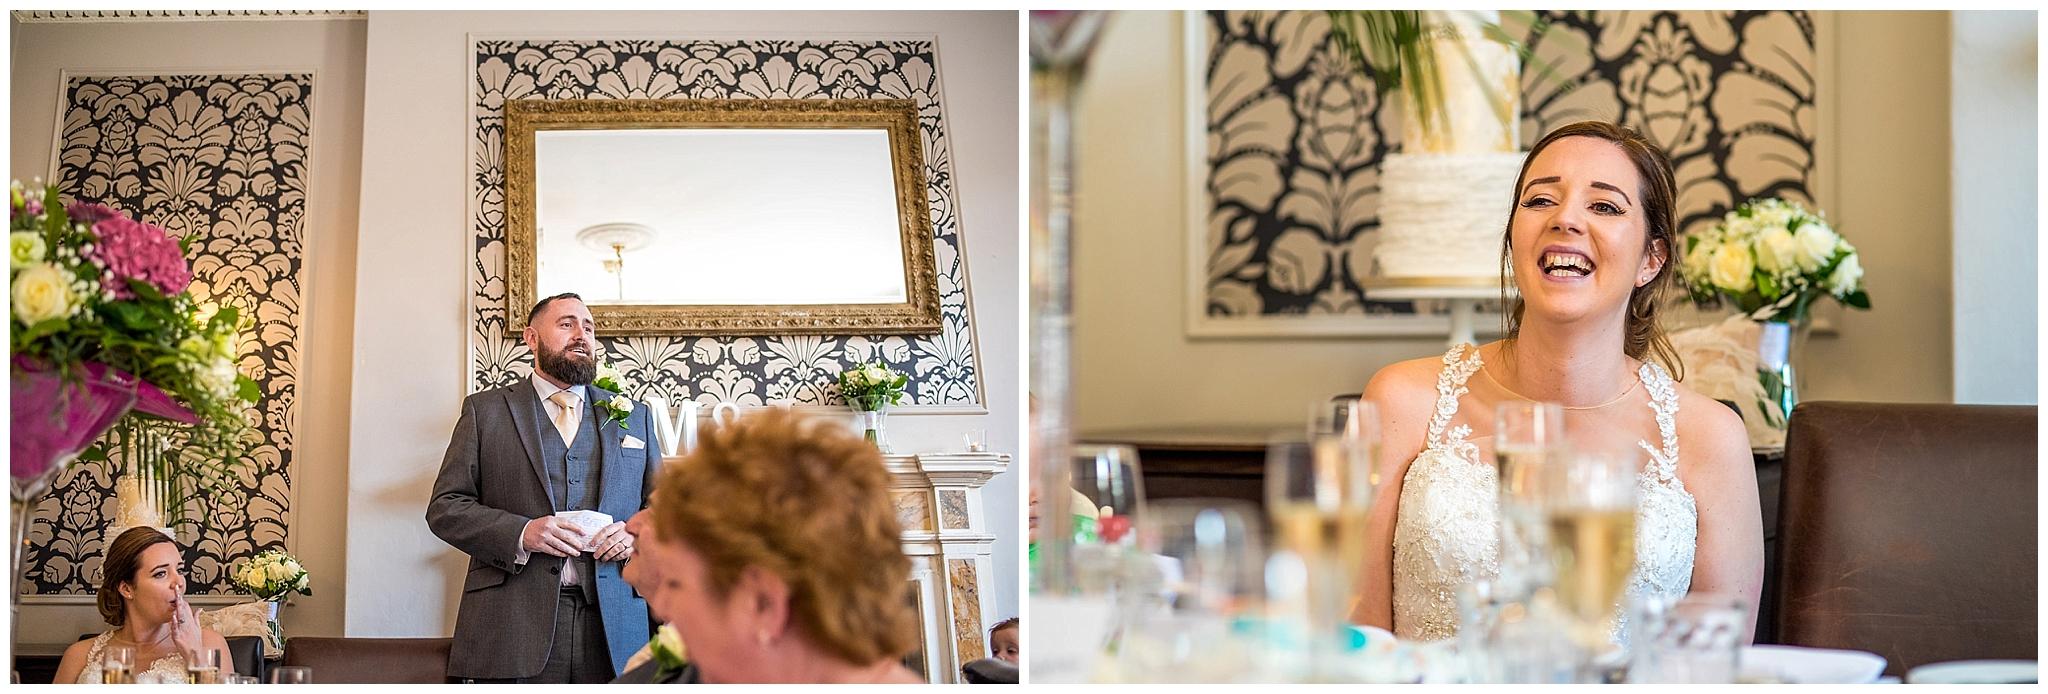 Lisa-&-Michael-Wedding-Guildhall-&-Hotel-Du-Vin-120